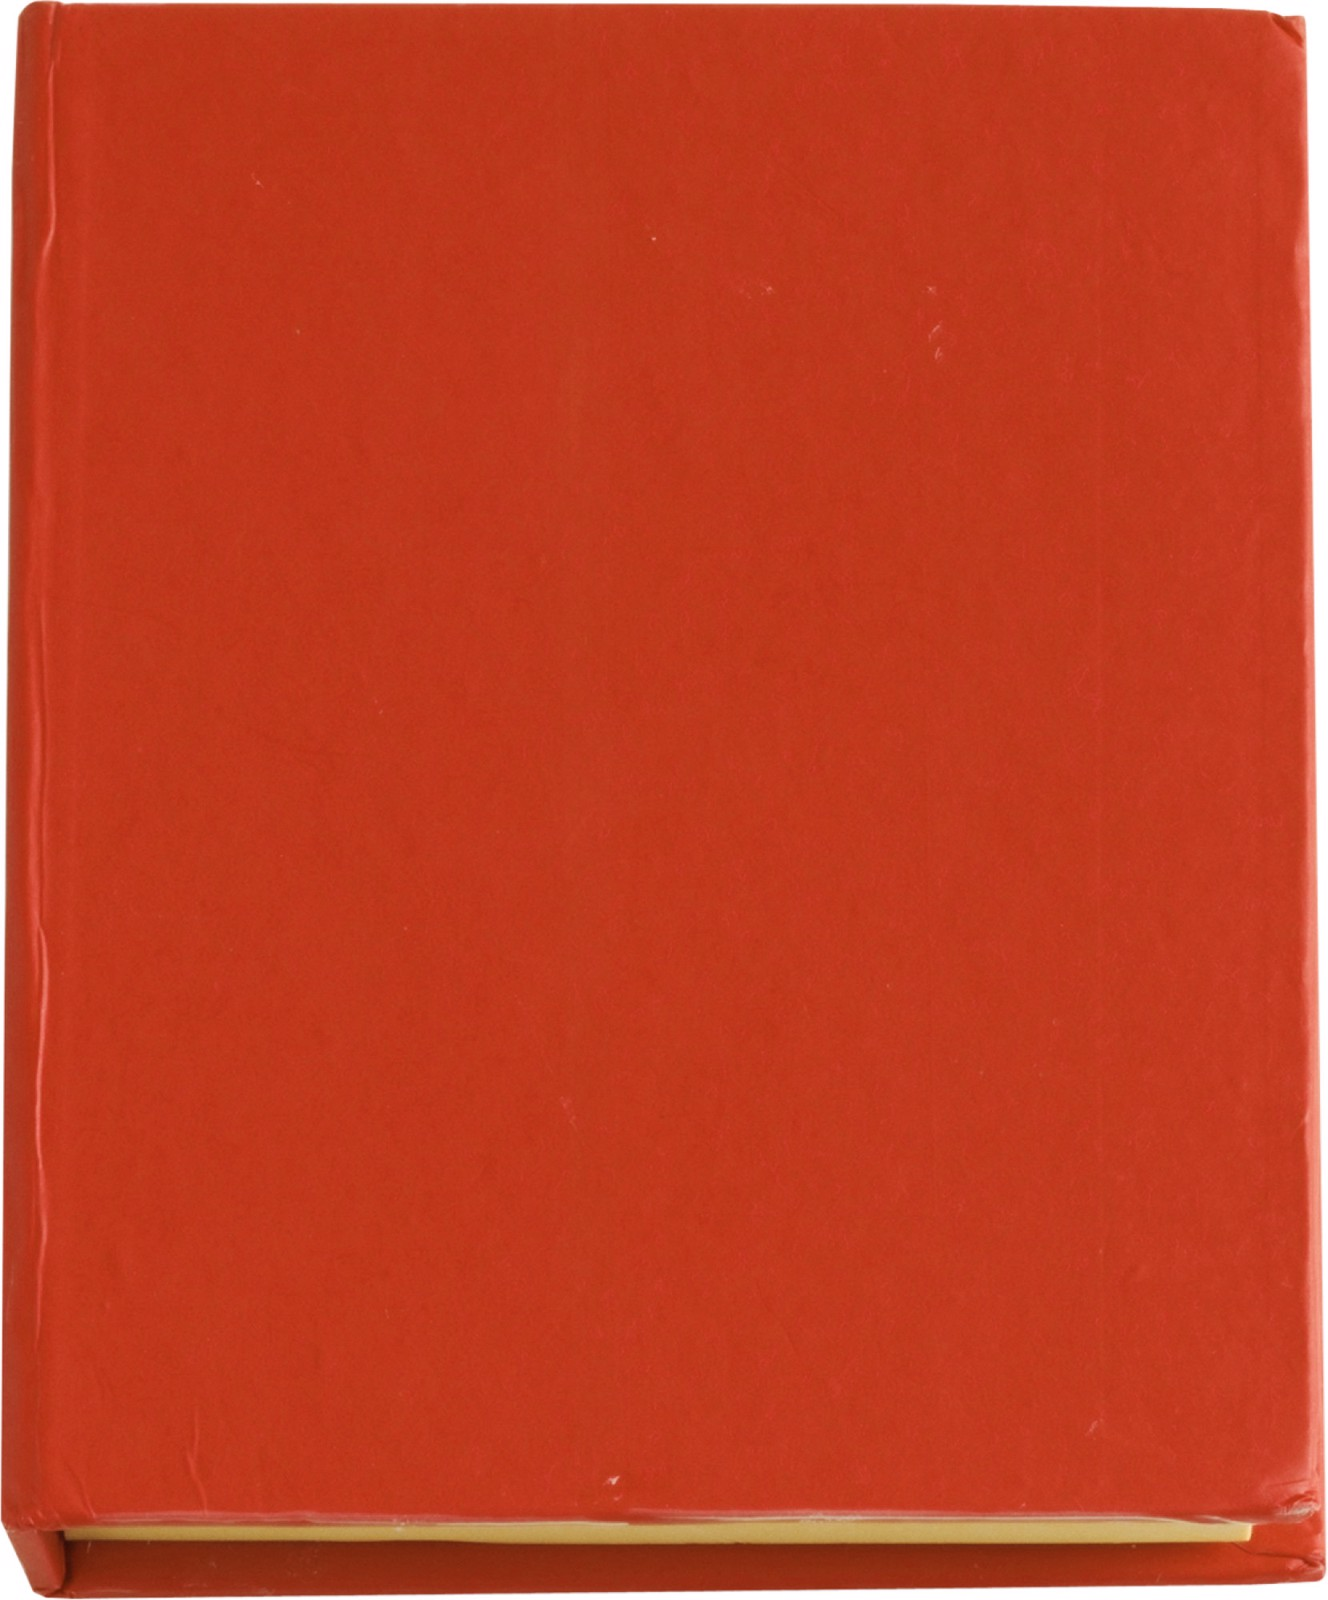 Soporte de cartón con memos - Red